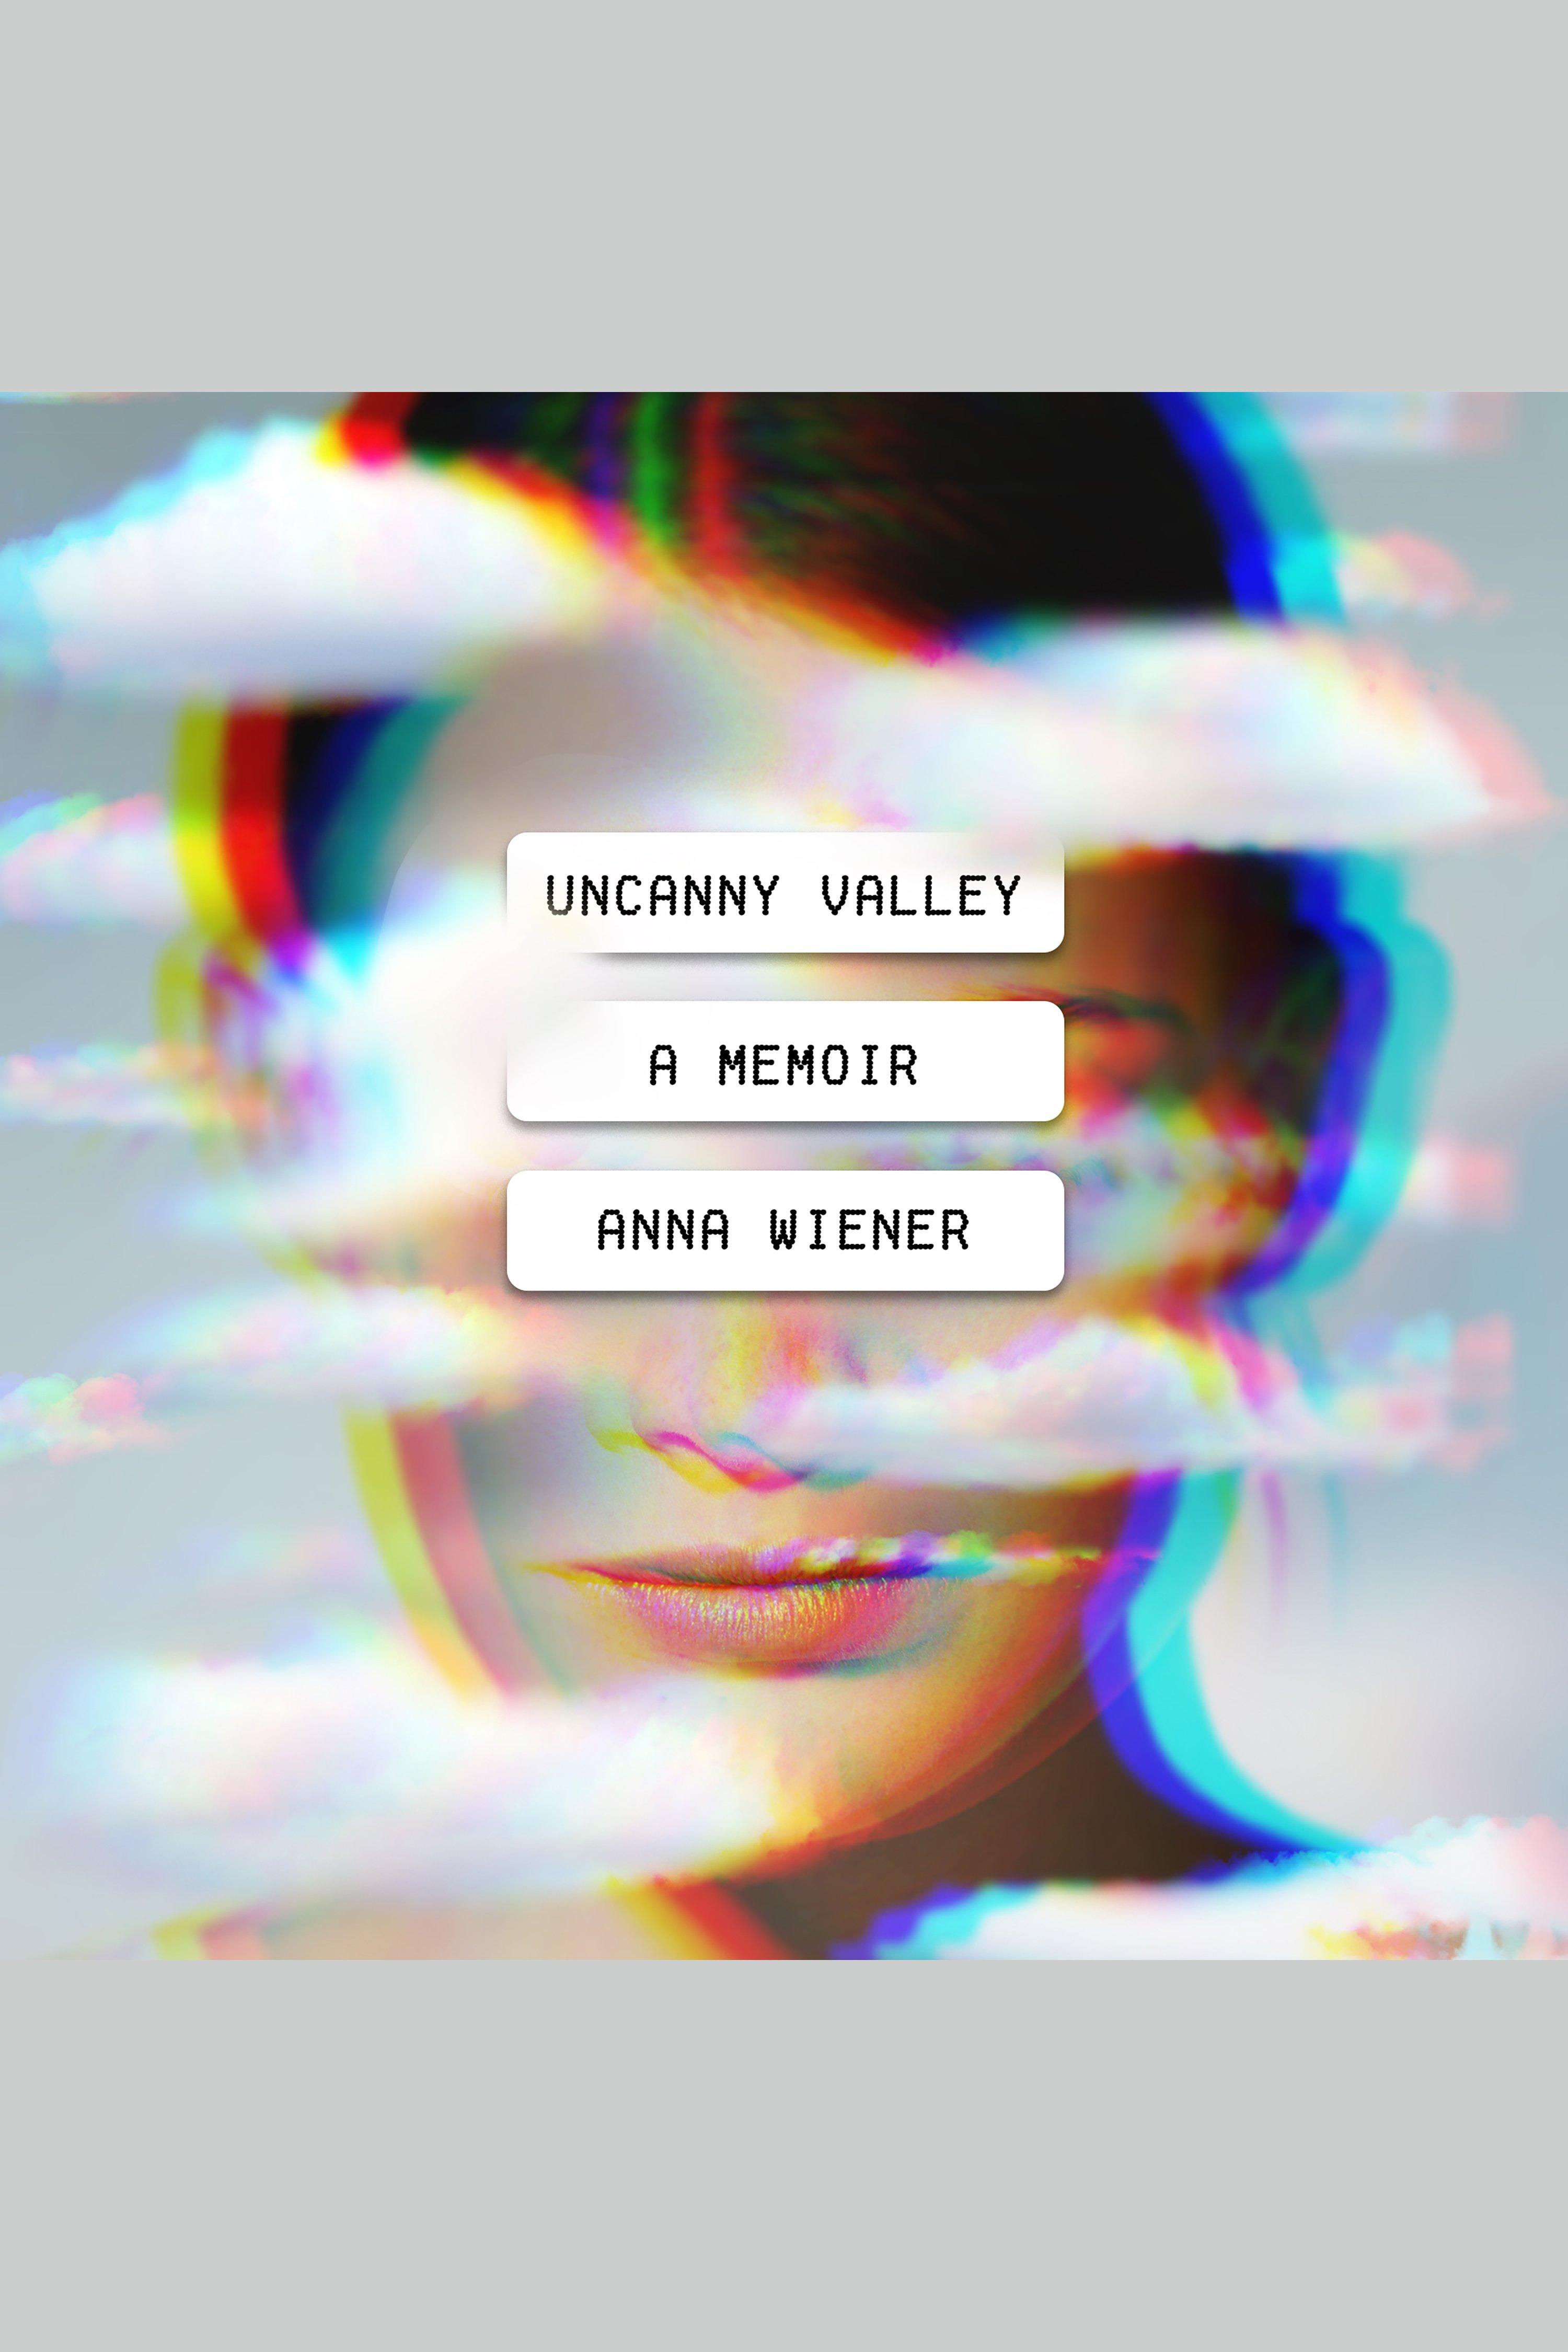 Uncanny Valley A Memoir